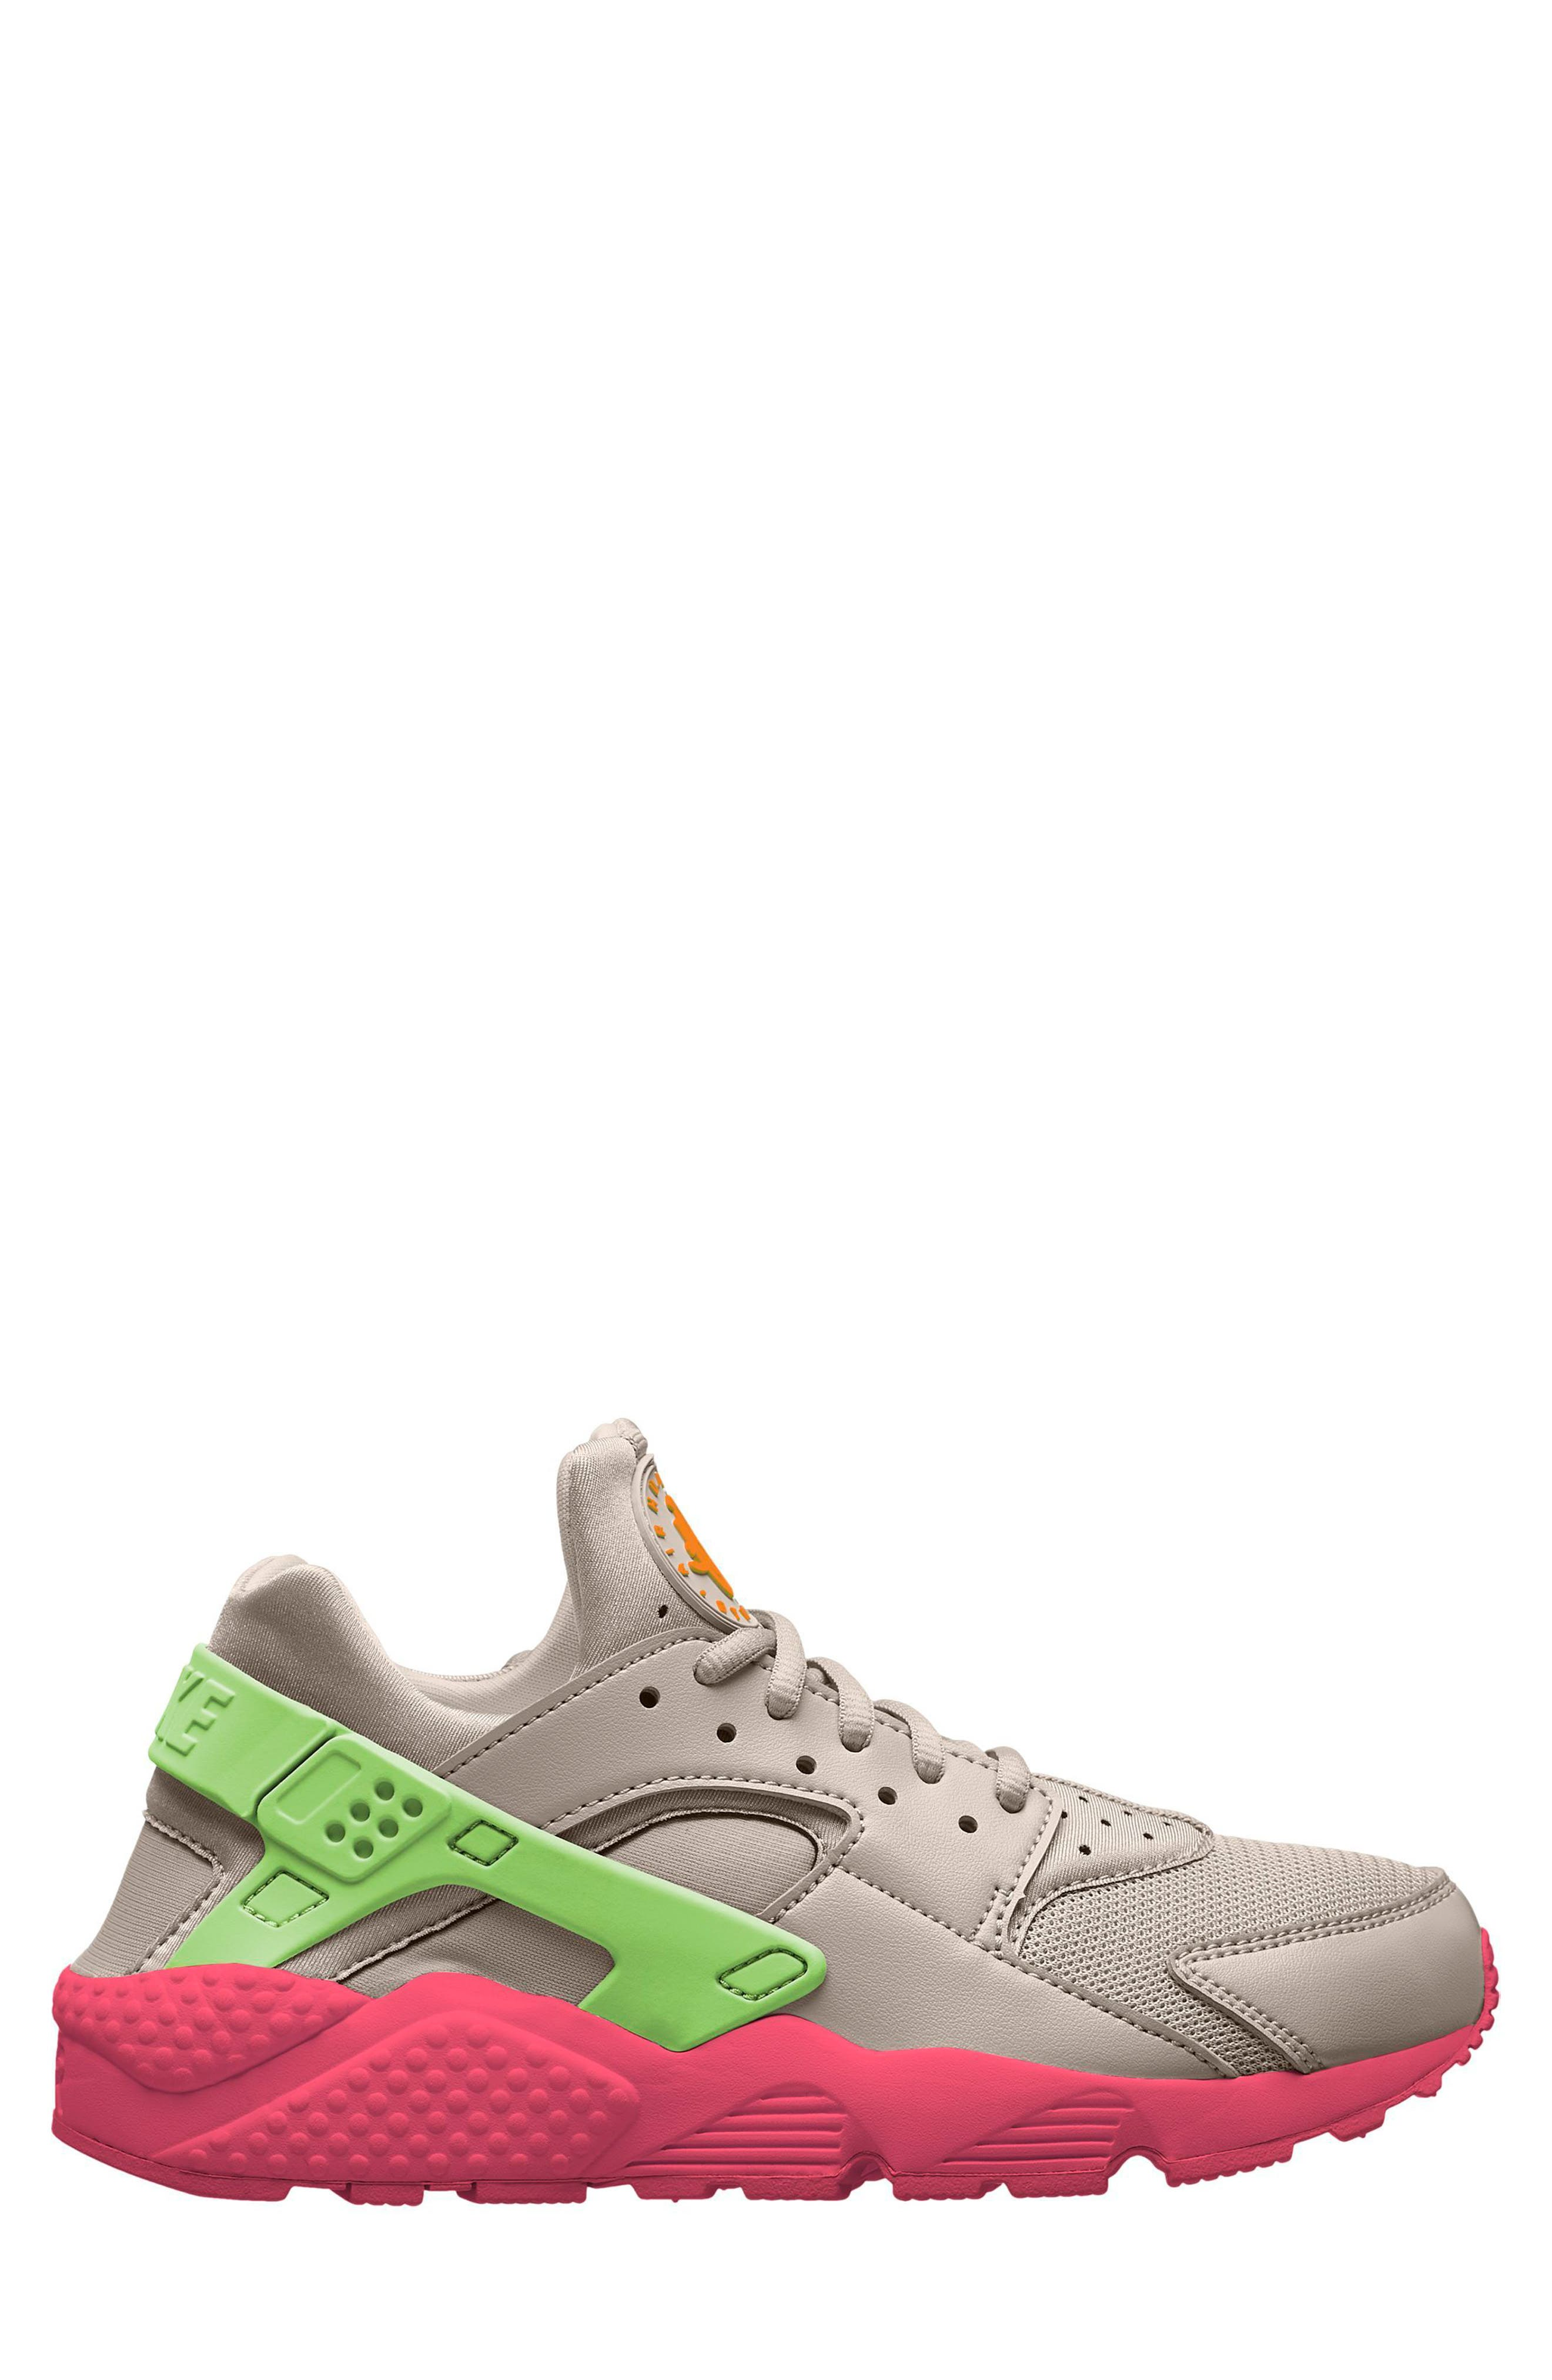 Main Image - Nike Air Huarache Run Sneaker (Women)